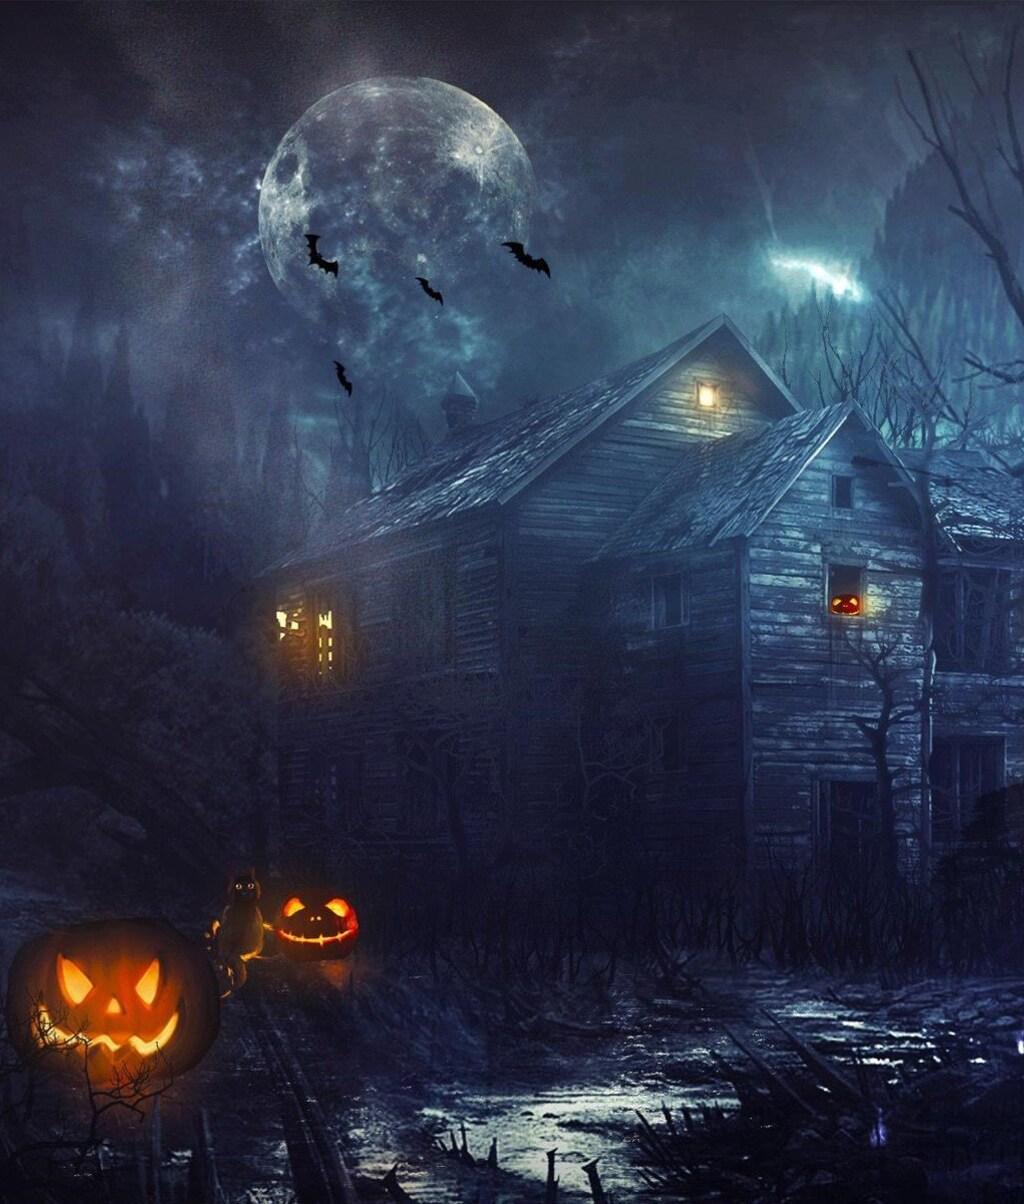 halloween wallpaper 2016 - photo #5